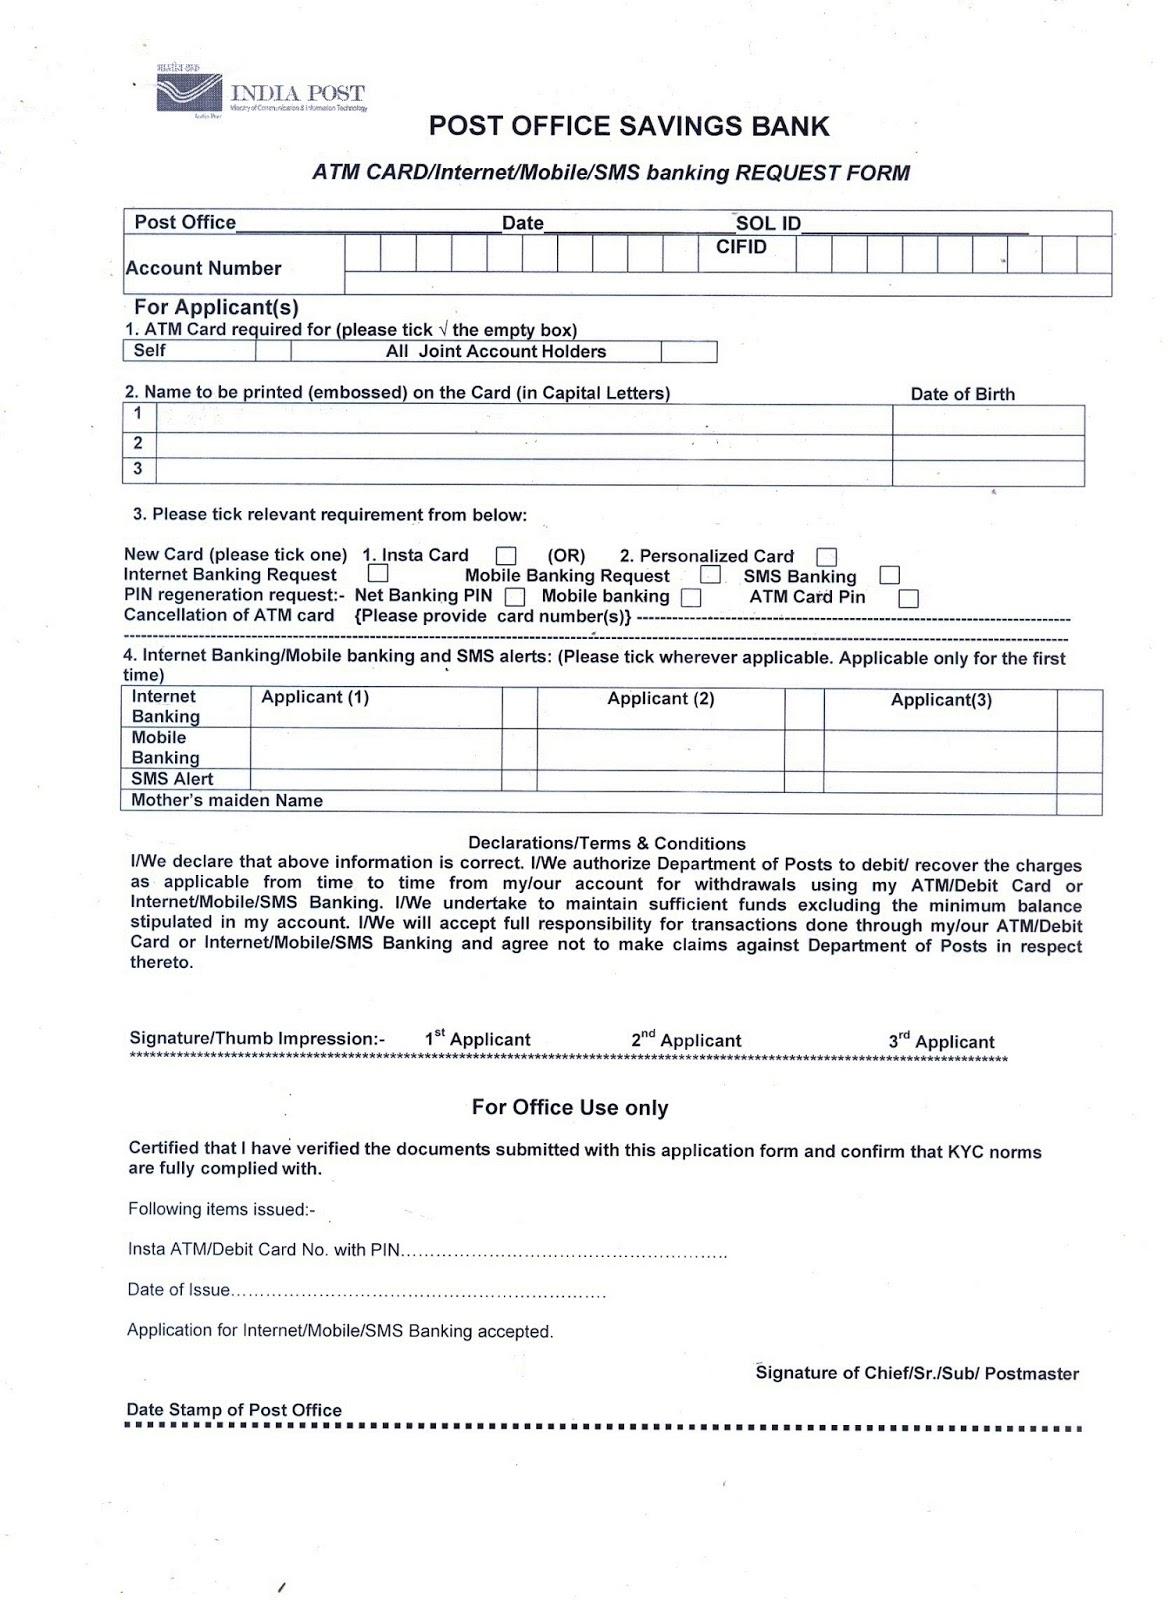 Postal info india post atm cardinternetmobilesms banking request india post atm cardinternetmobilesms banking request form thecheapjerseys Gallery